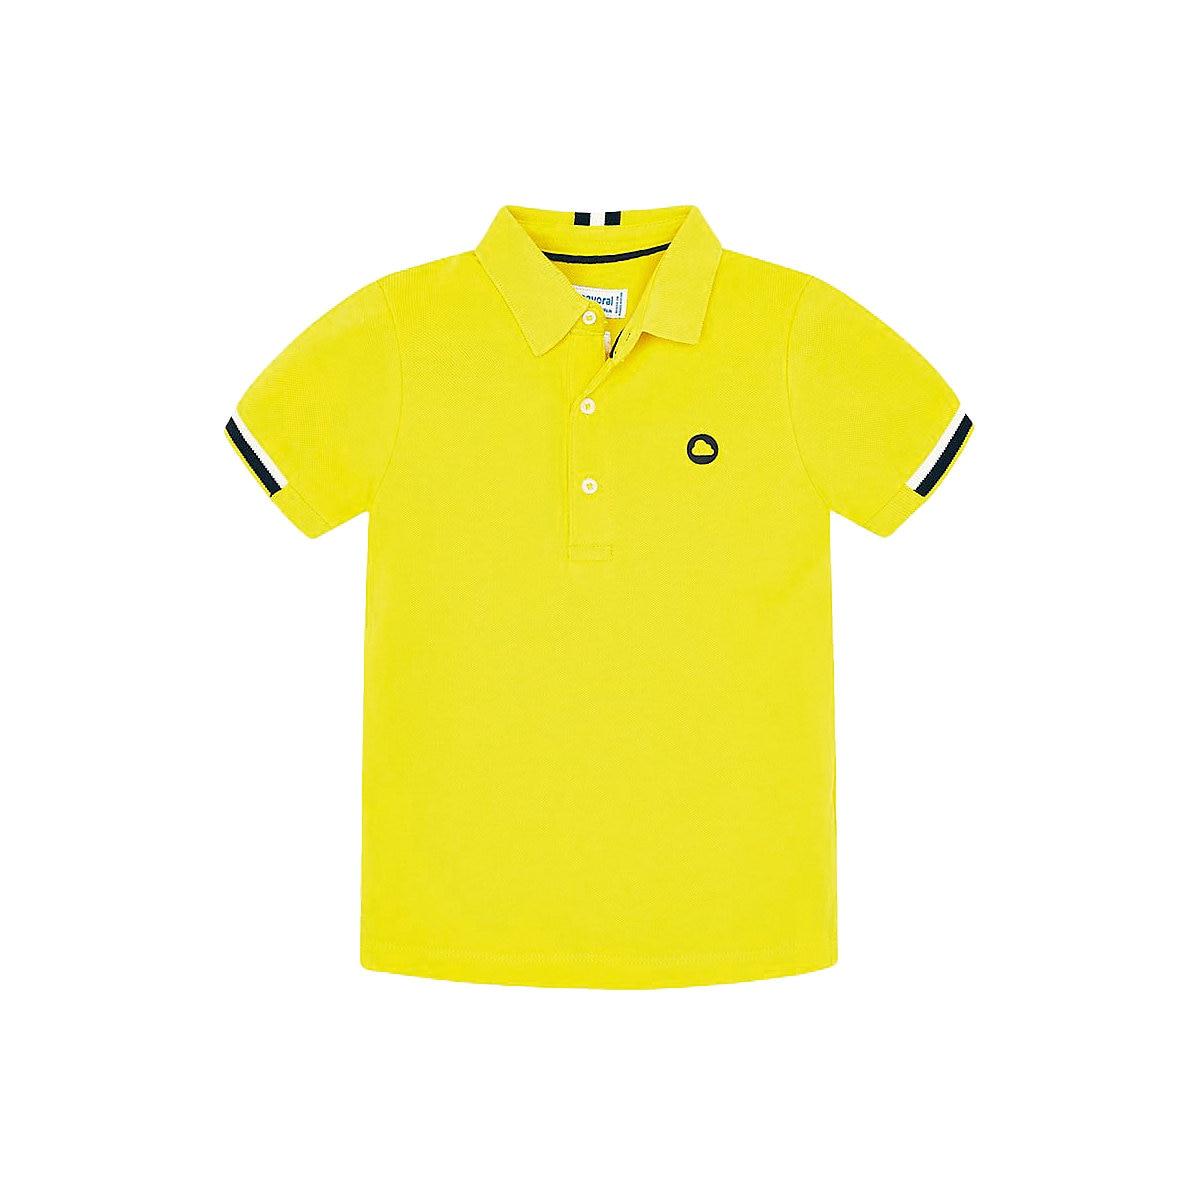 MAYORAL Polo Shirts 10692529 children clothing t-shirt shirt the print for boys